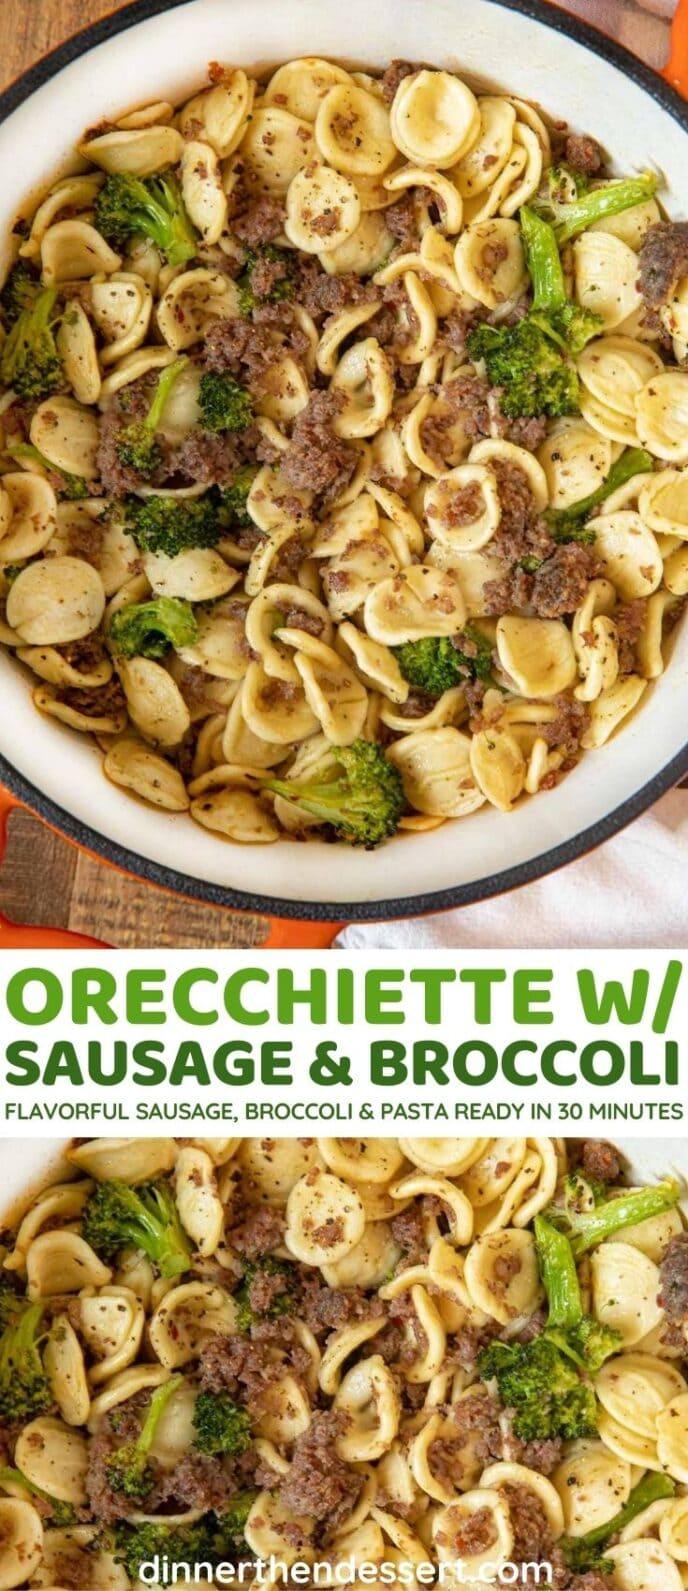 Orecchiete with Sausage and Broccoli collage